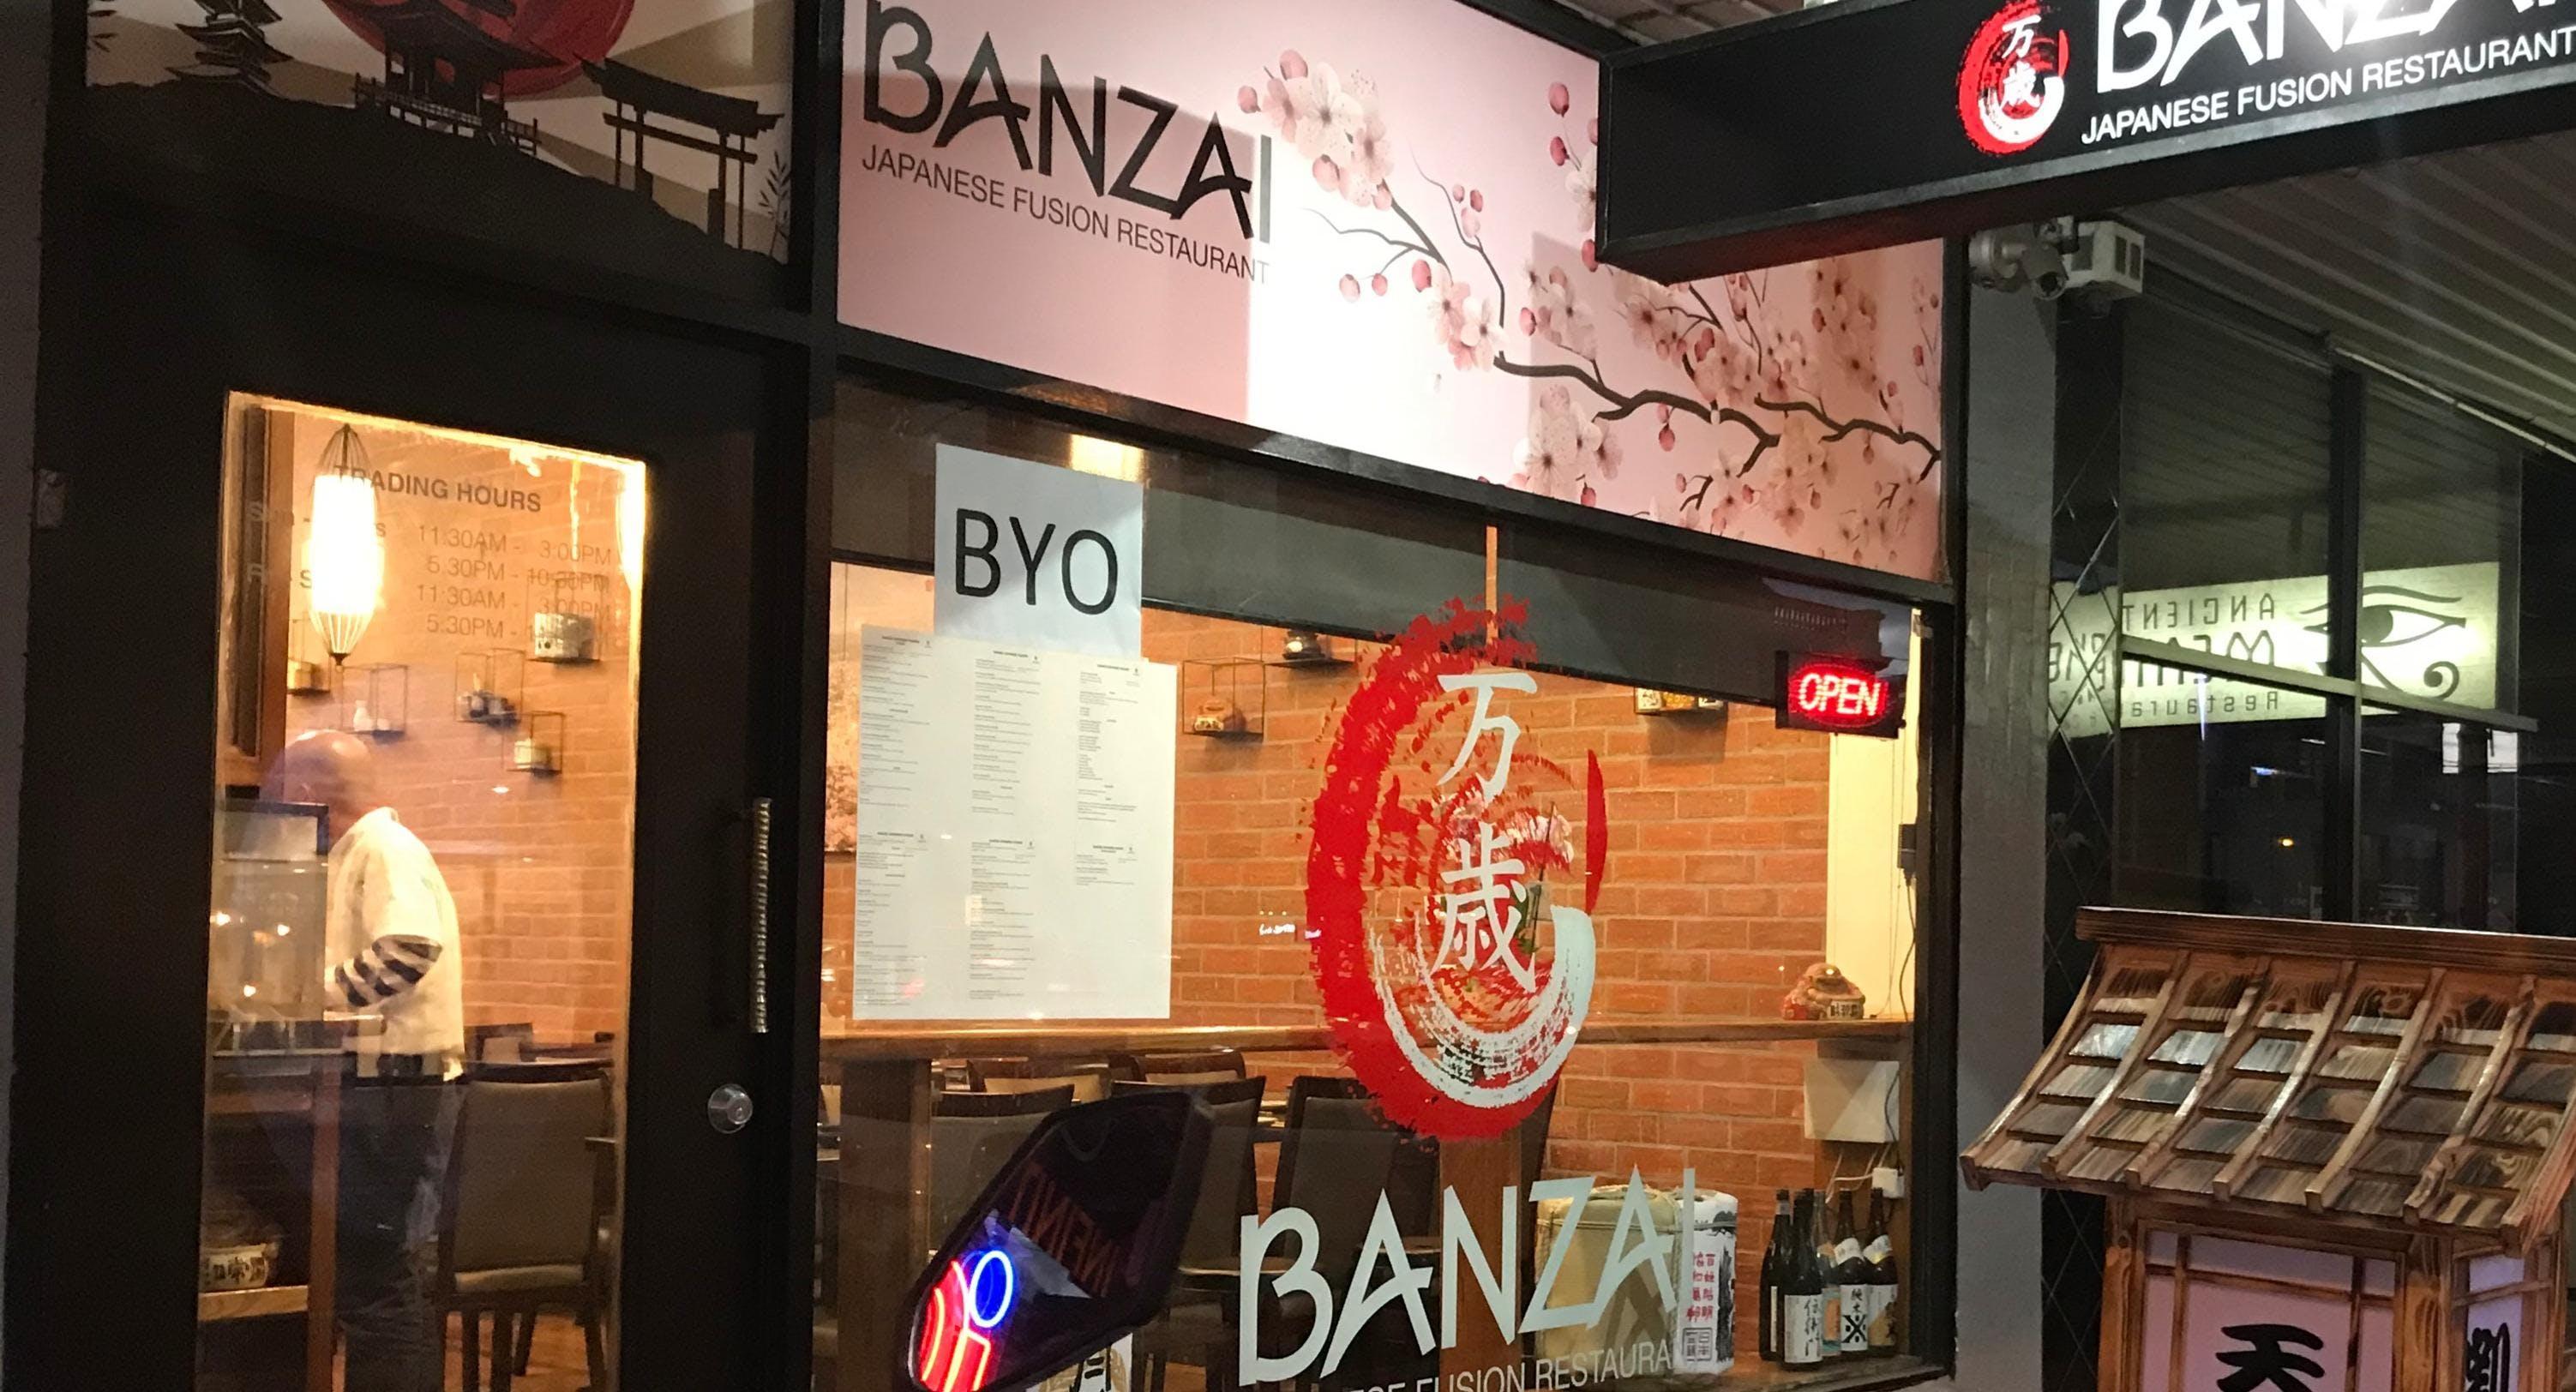 Banzai Japanese Fusion Restaurant Melbourne image 3